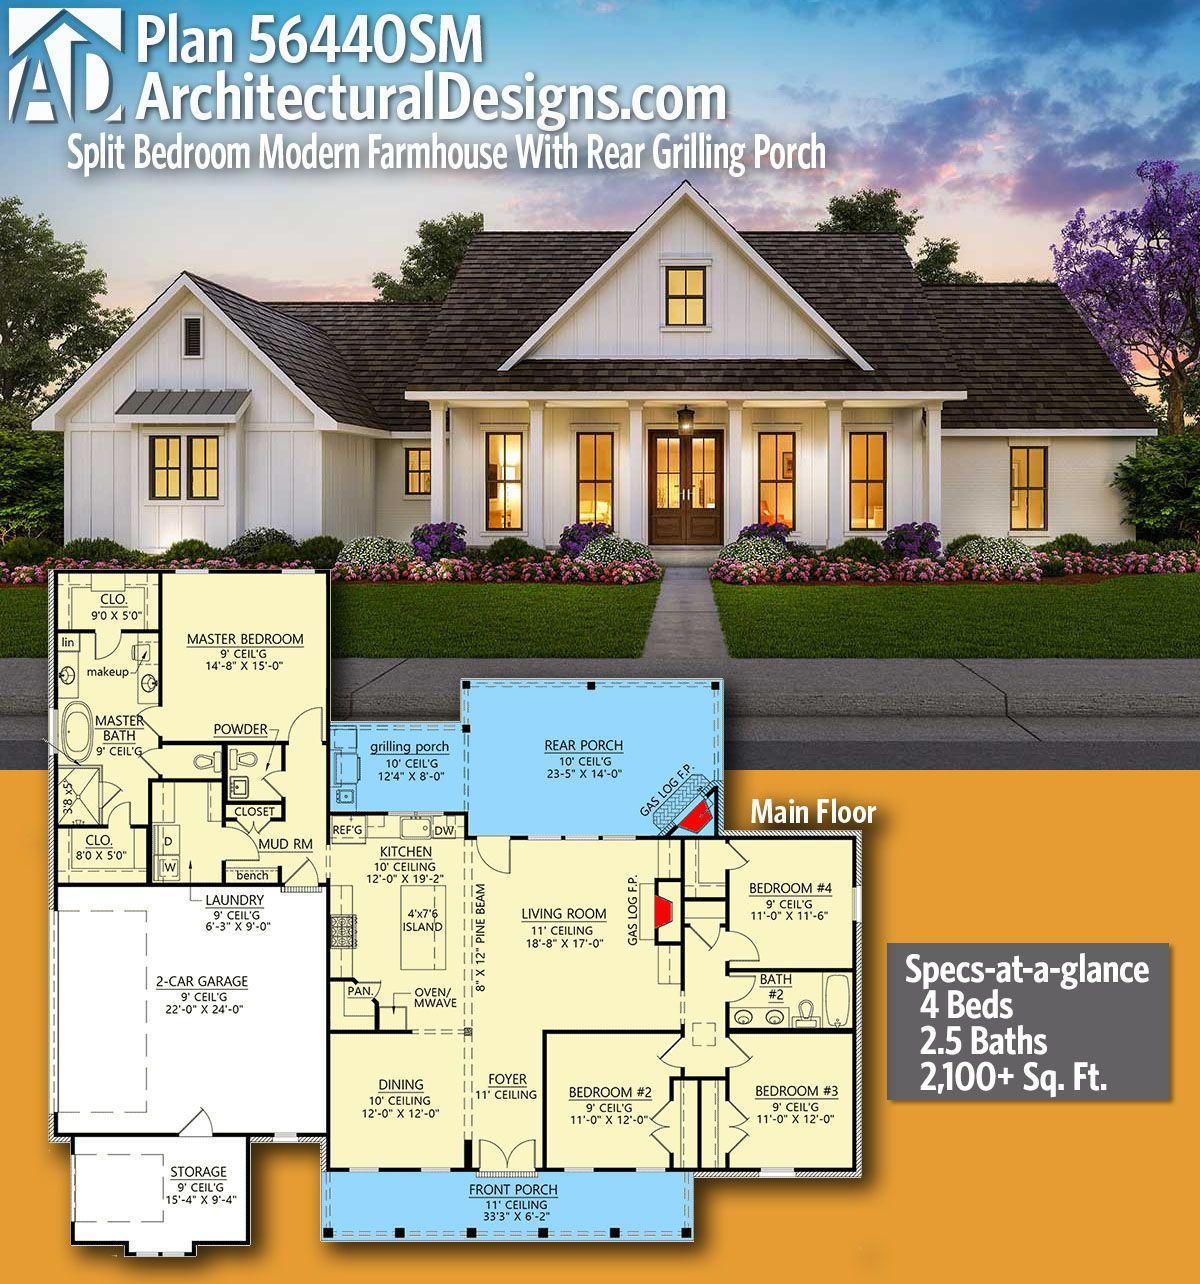 Plan 56440sm Split Bedroom Modern Farmhouse With Rear Grilling Porch In 2020 Modern Farmhouse